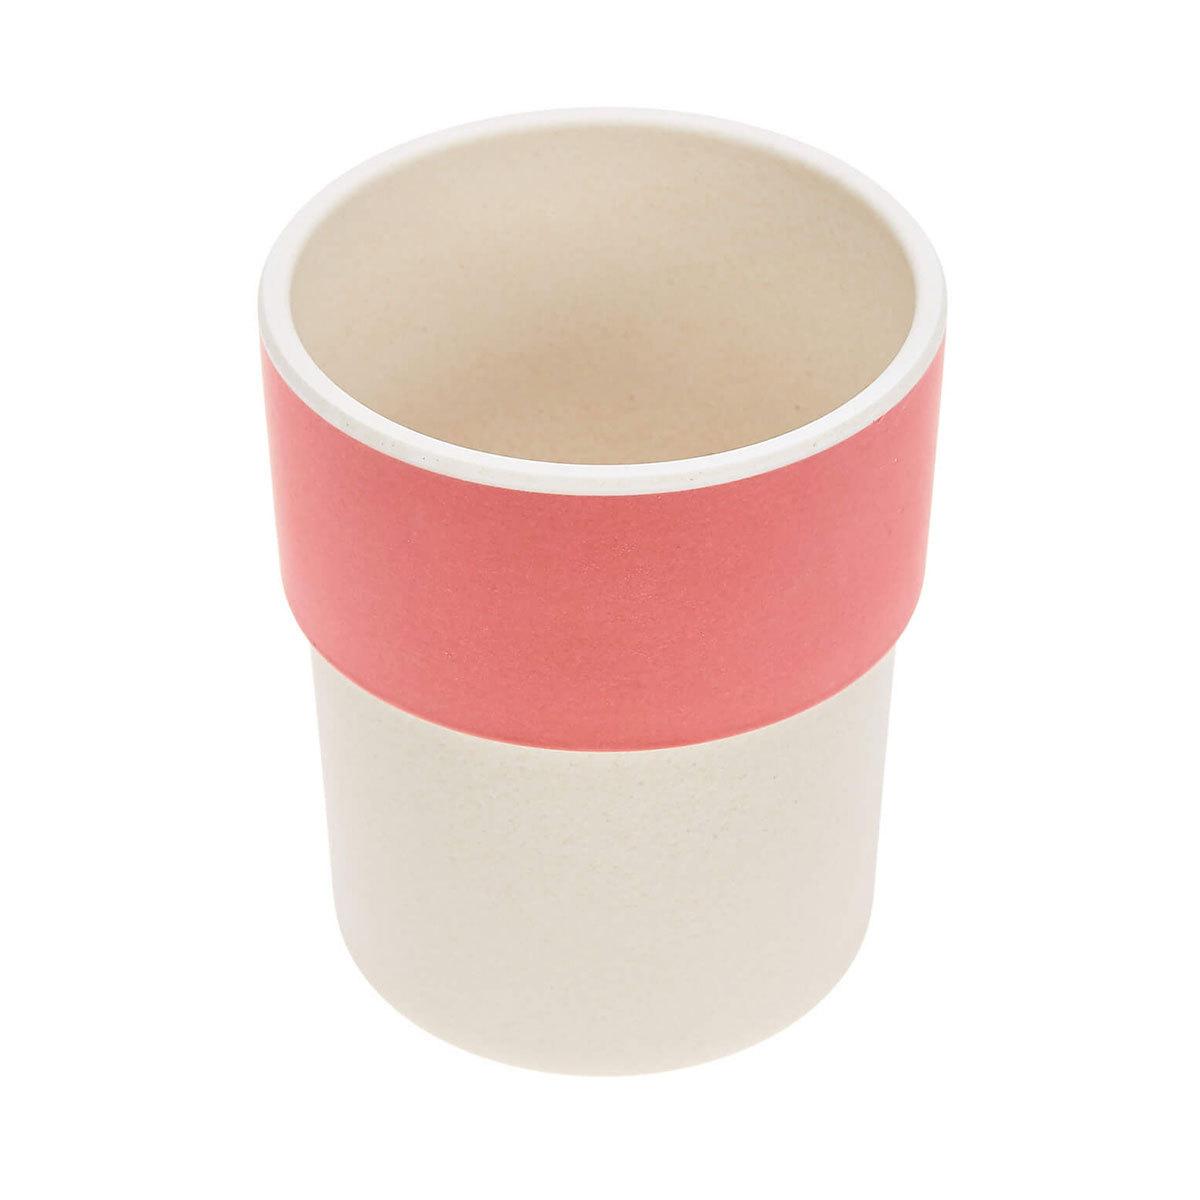 Tasse & Verre Tasse en Bambou Glama Lama - Corail Tasse en Bambou Glama Lama - Corail